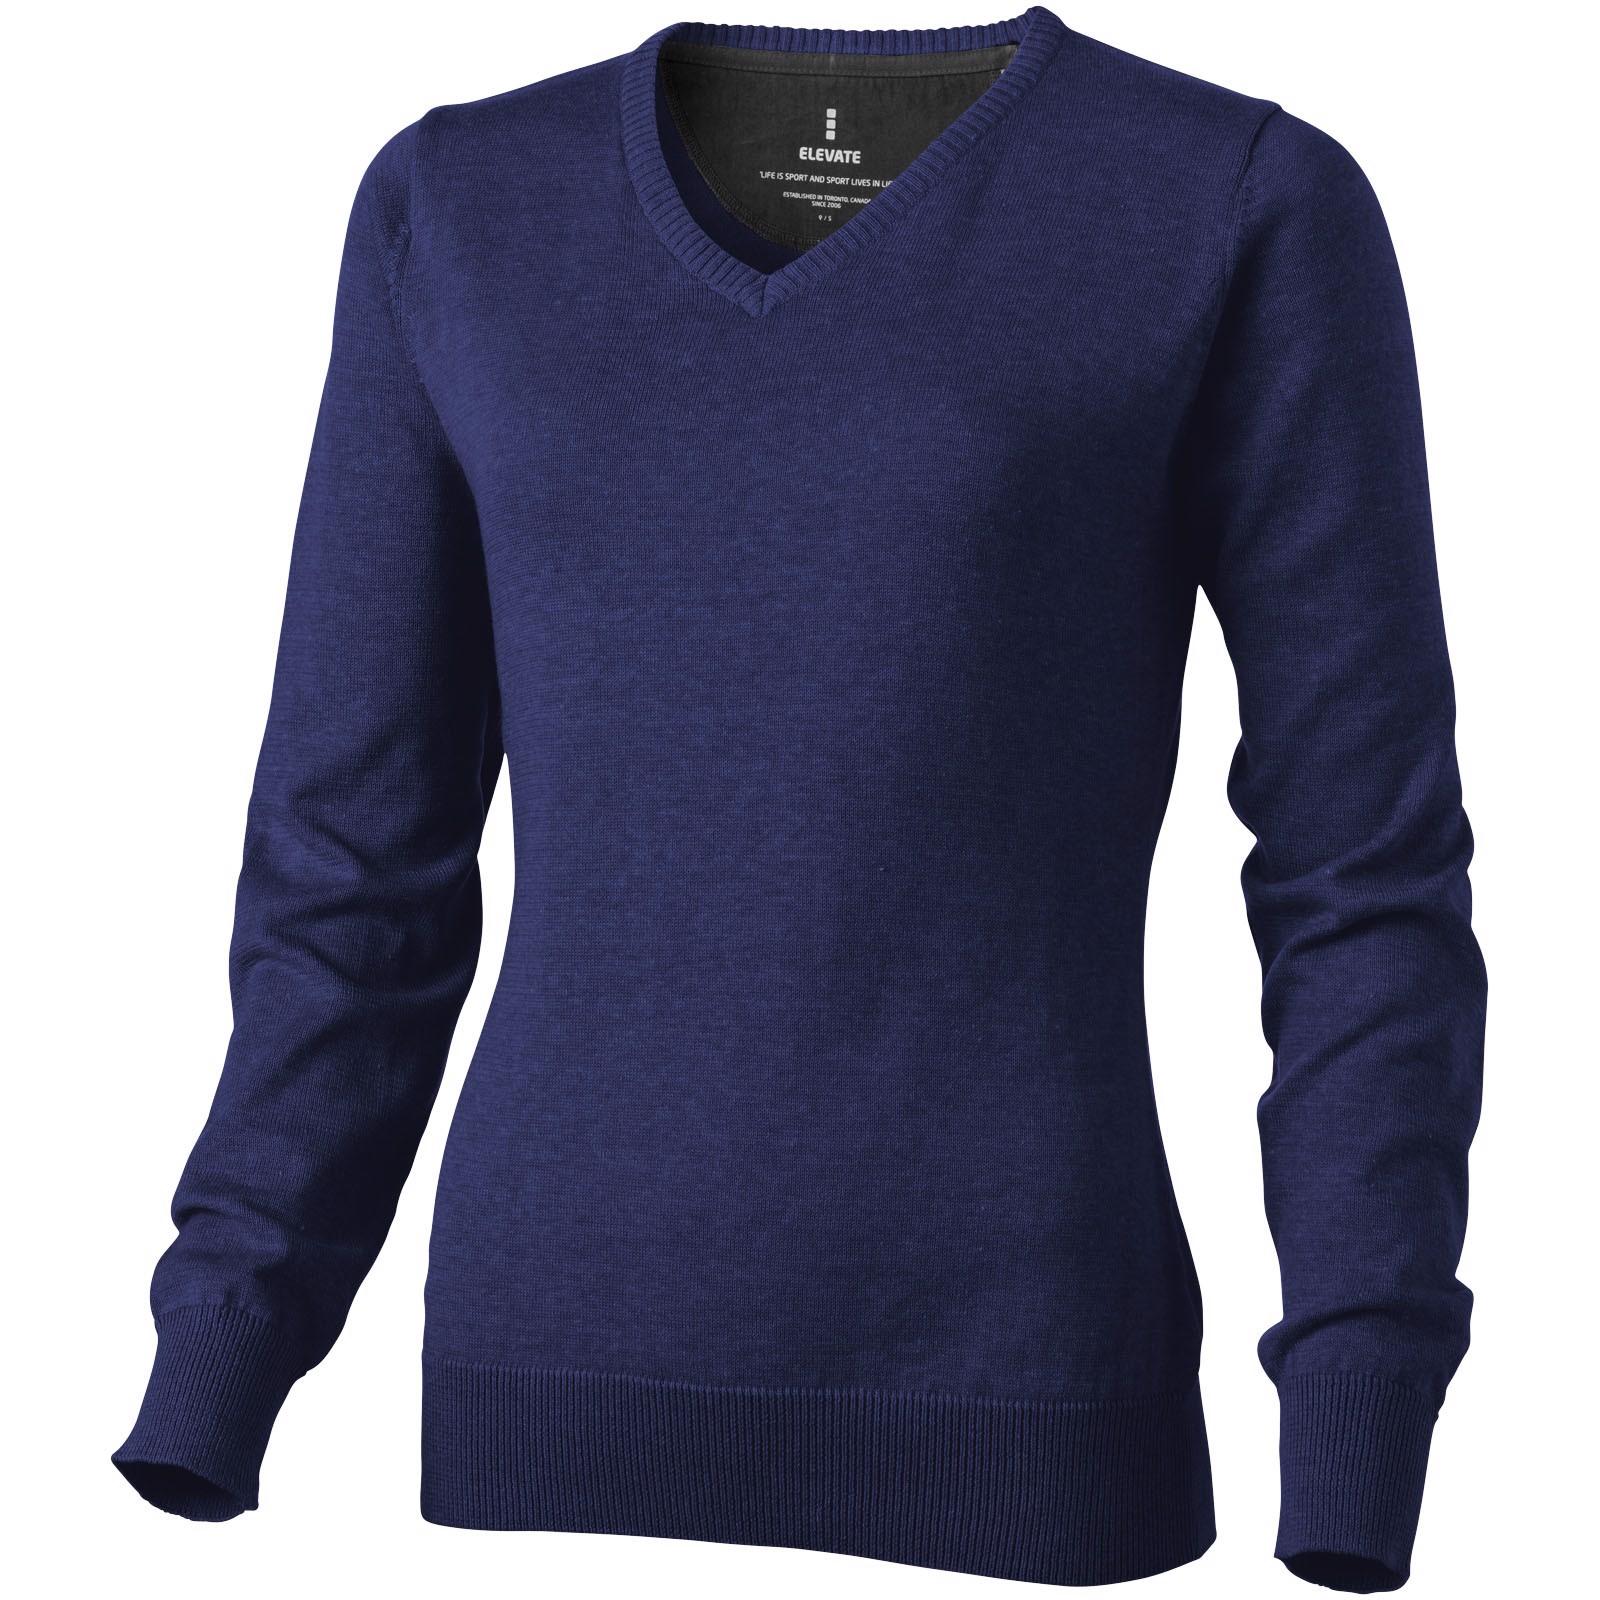 Spruce women's v-neck pullover - Navy / S